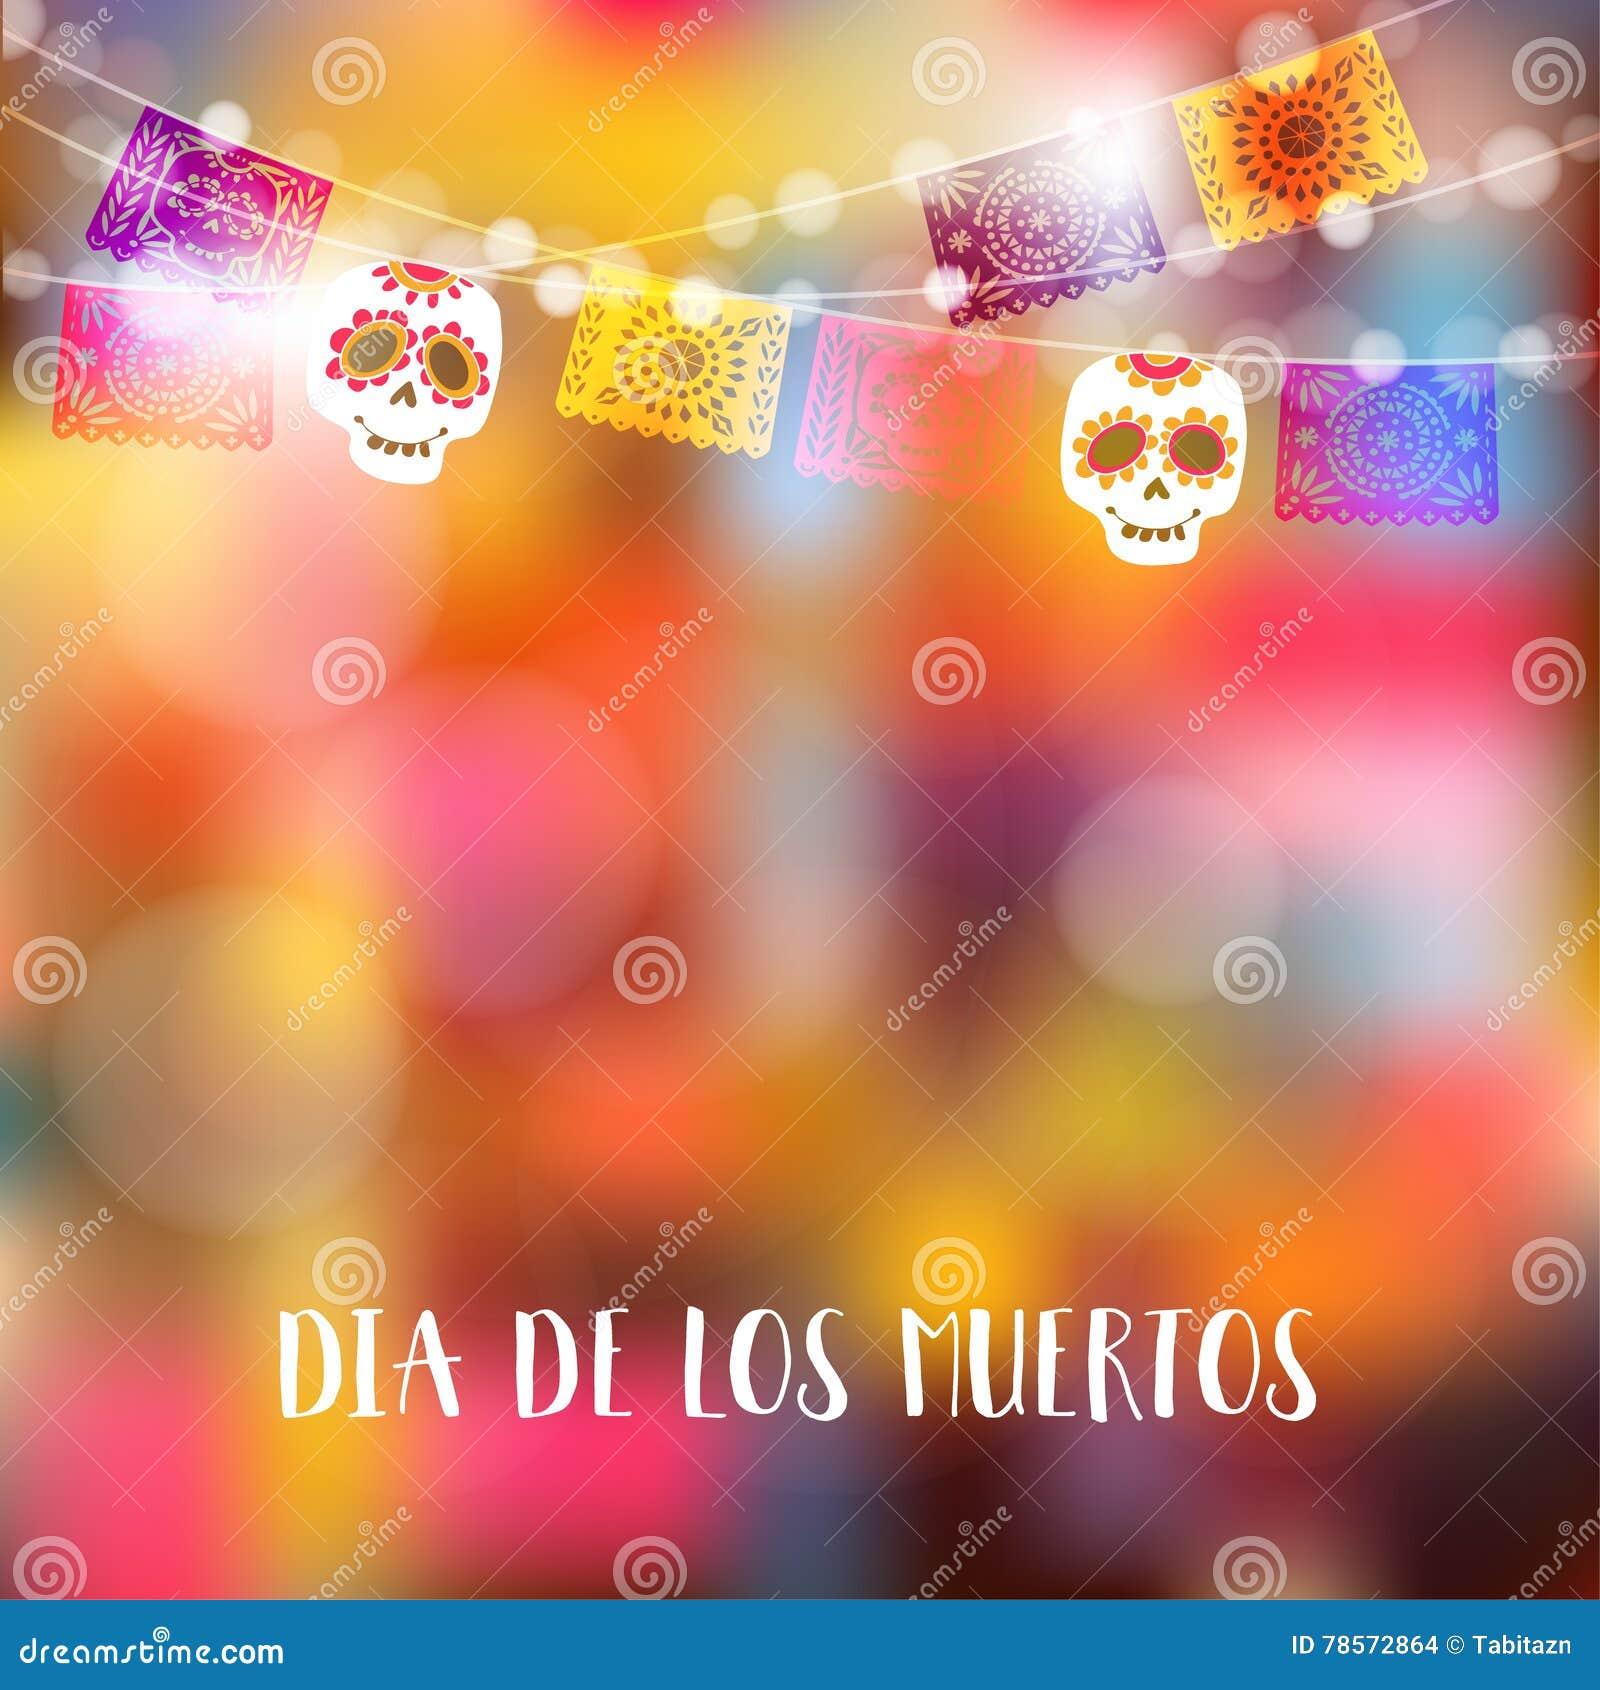 Dia de Los Muertos,死者或万圣夜卡片,邀请的天 集会装饰,光,与头骨的党旗子串